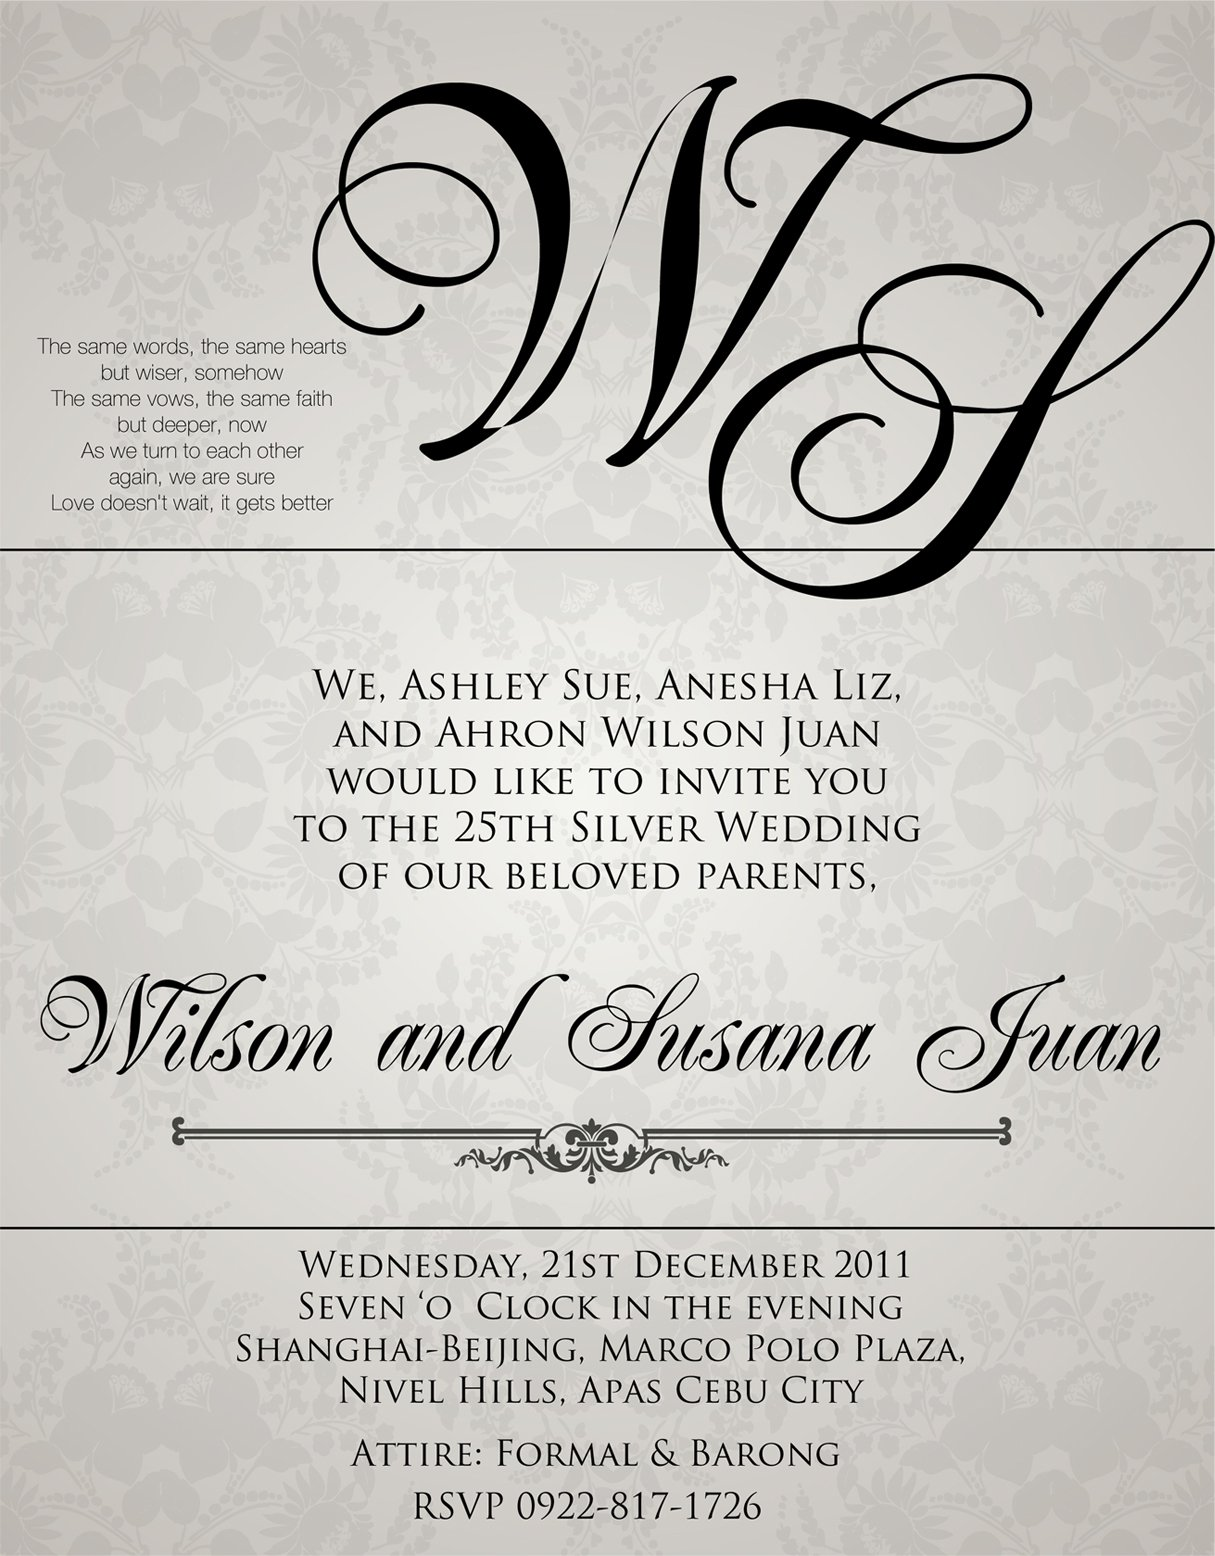 Corporate invitation designs sample invitation designs wedding 1215 x 1556 stopboris Image collections